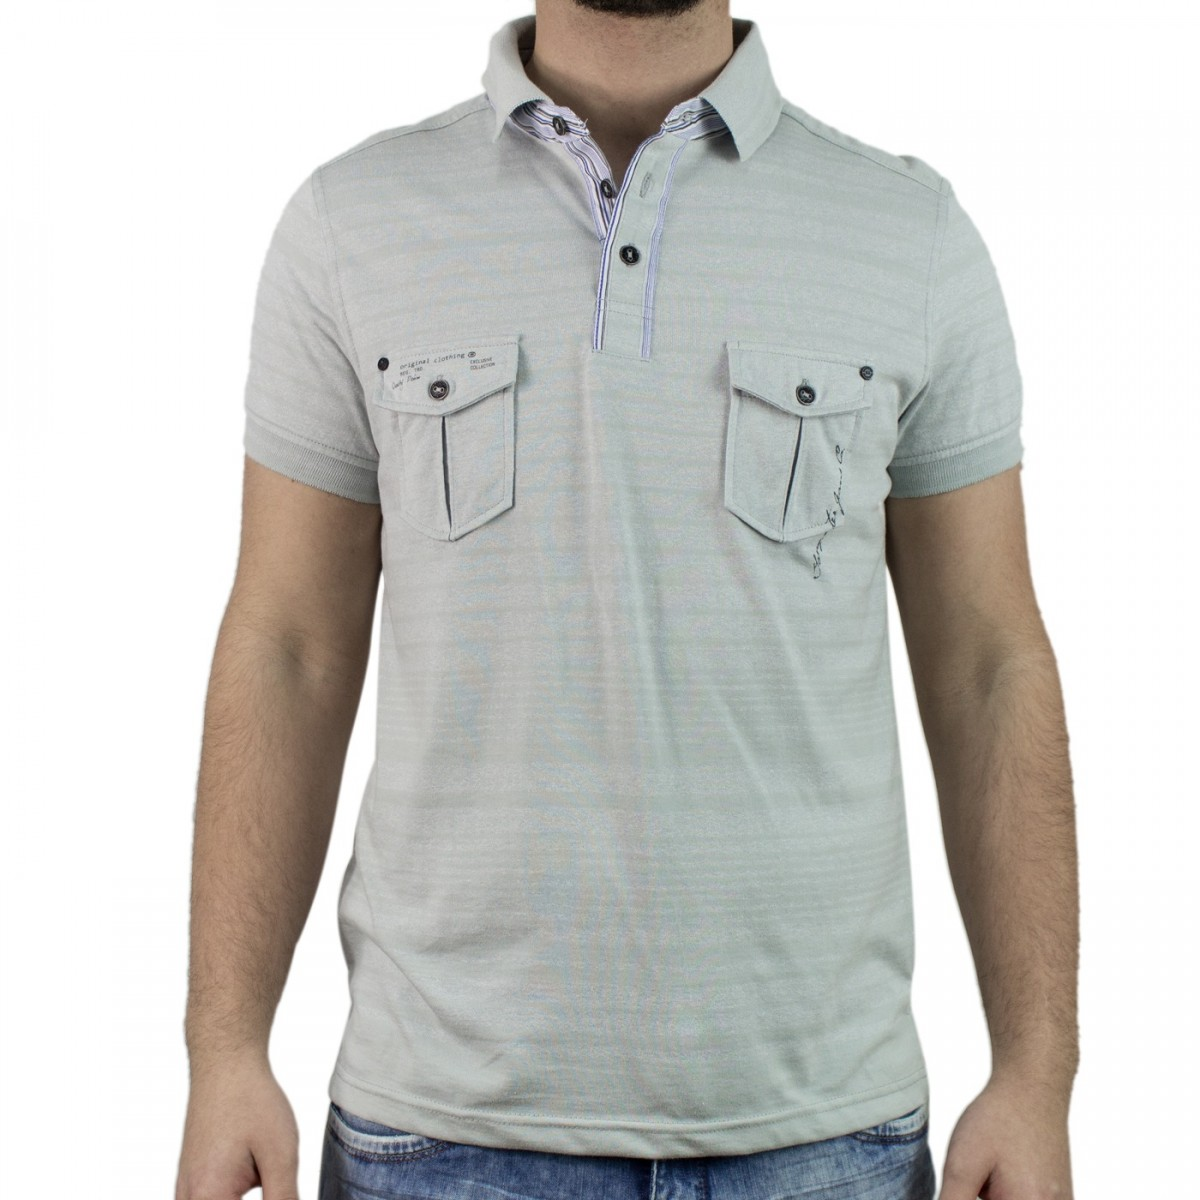 02b5b3f3df851 Bizz Store - Camisa Polo Masculina Gangster Manga Curta Cinza